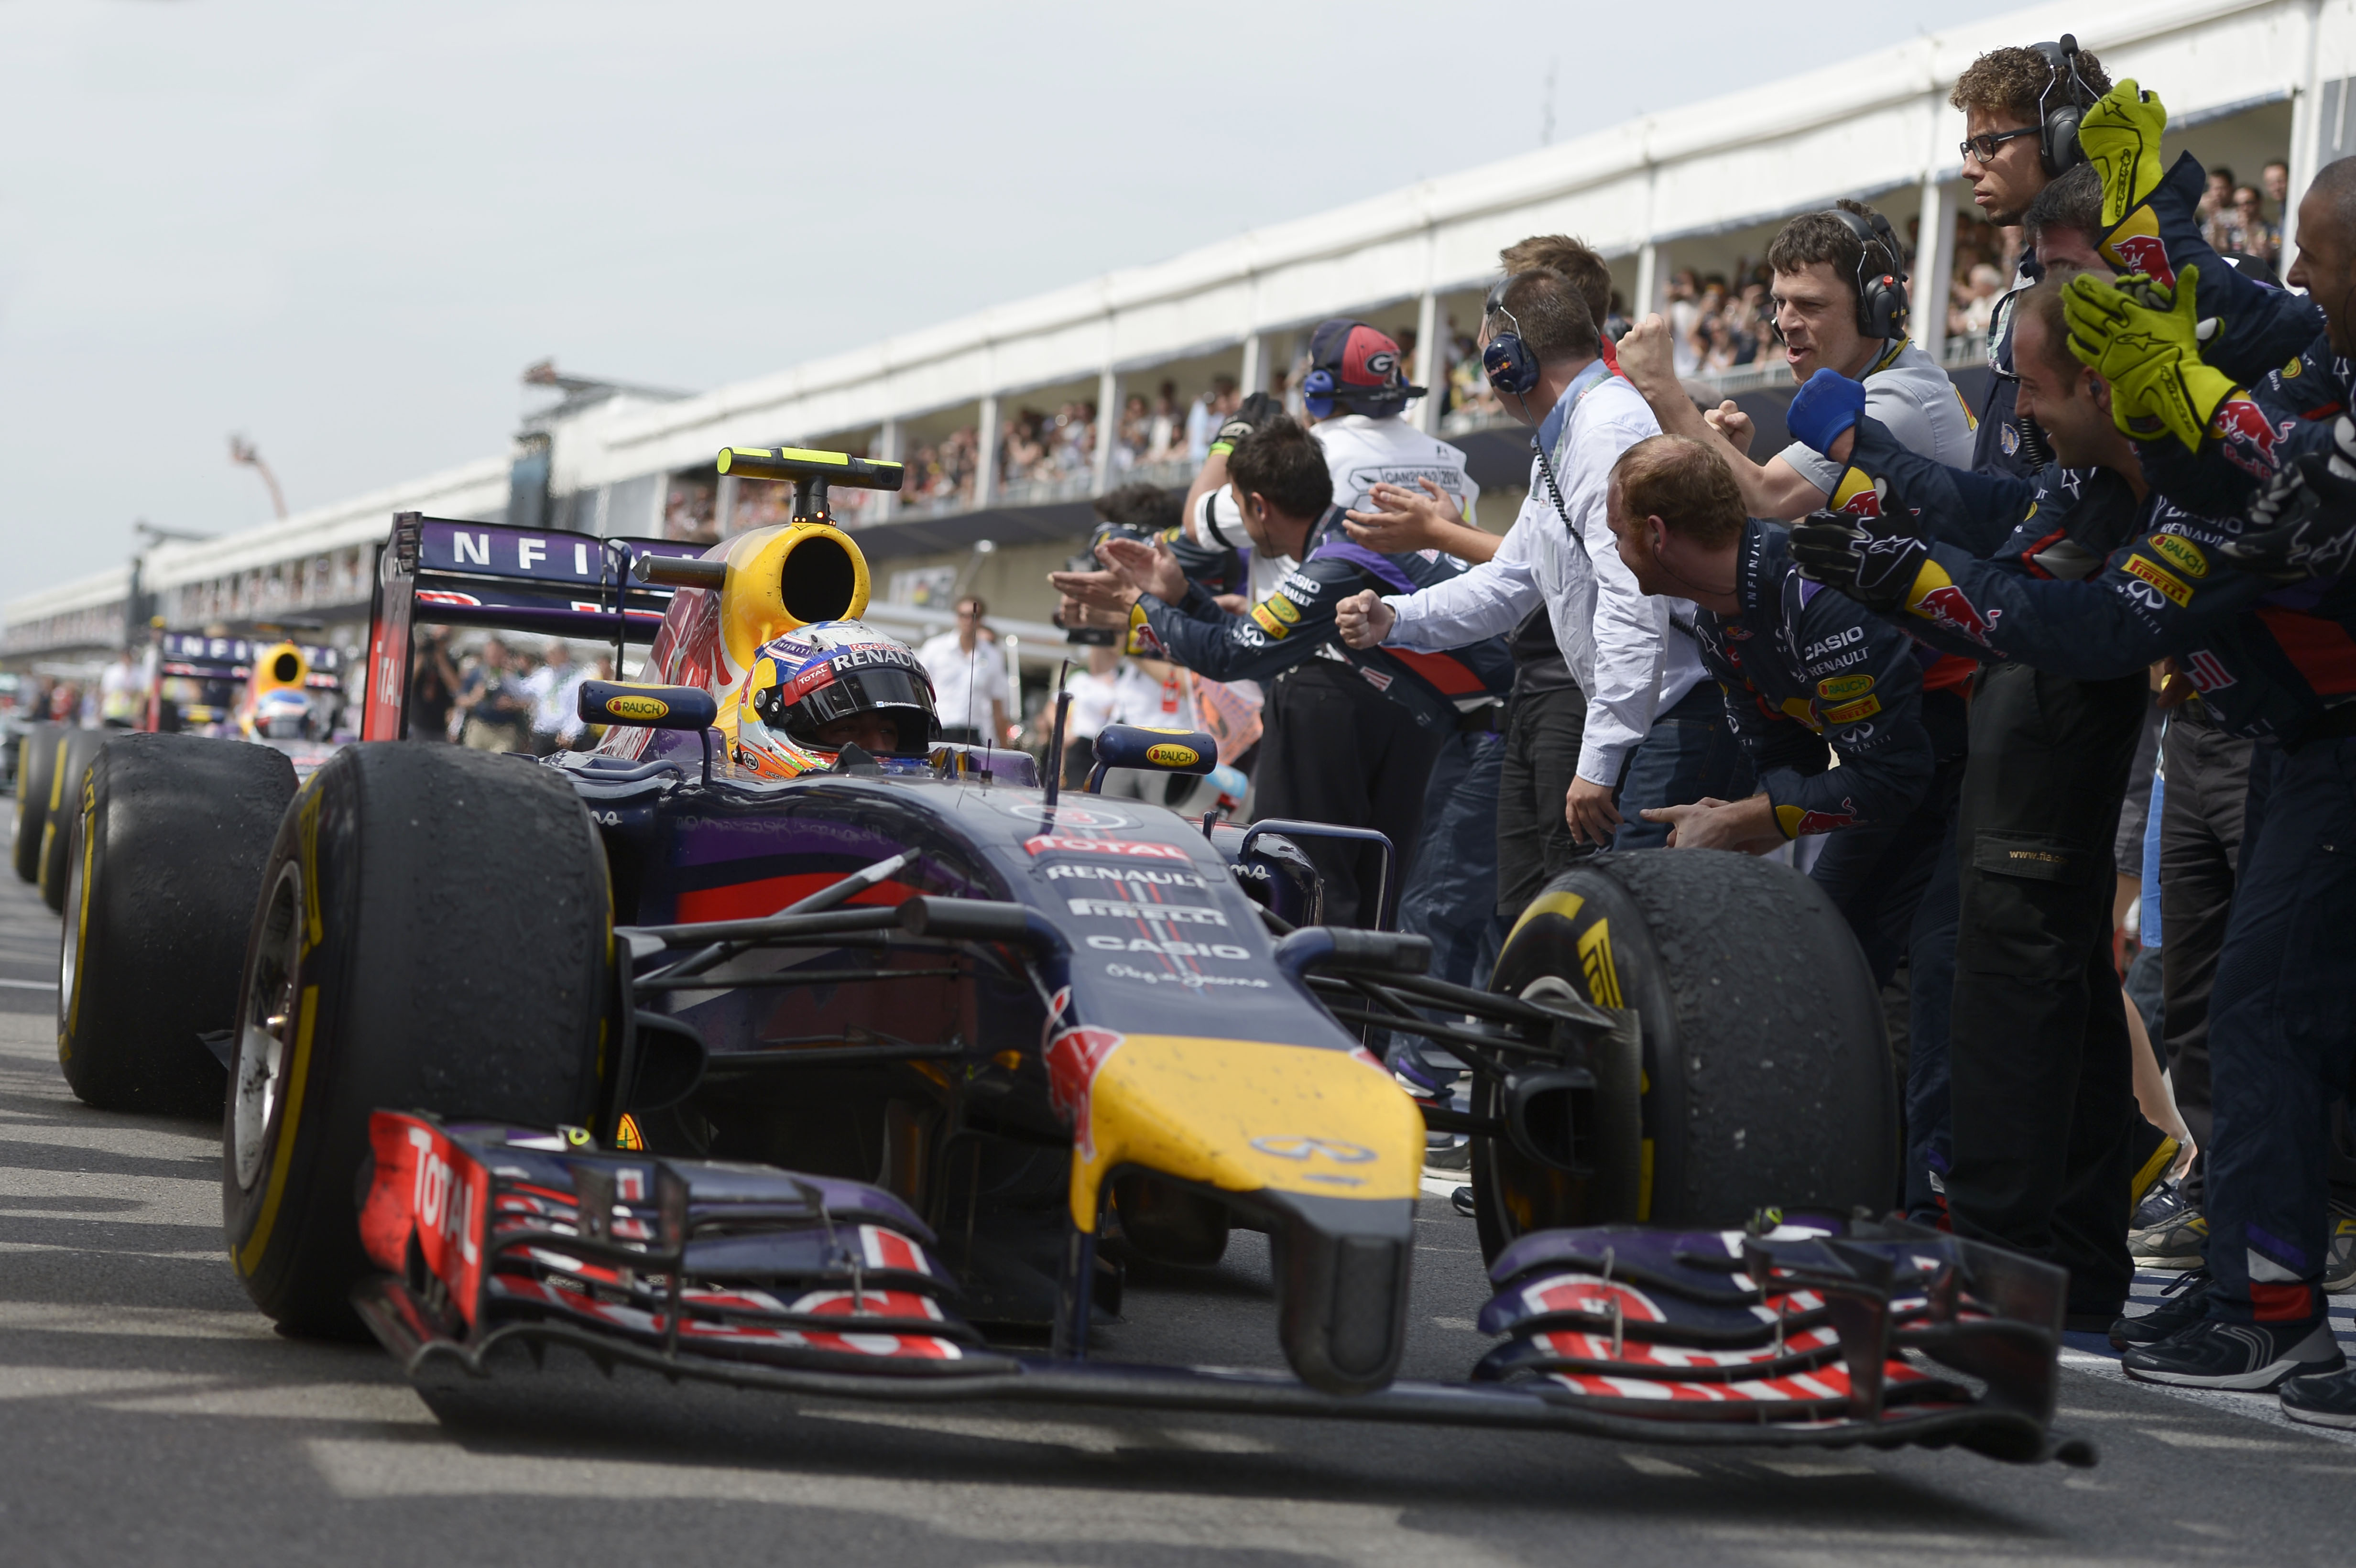 Daniel Ricciardo wins Canadian Grand Prix 2014